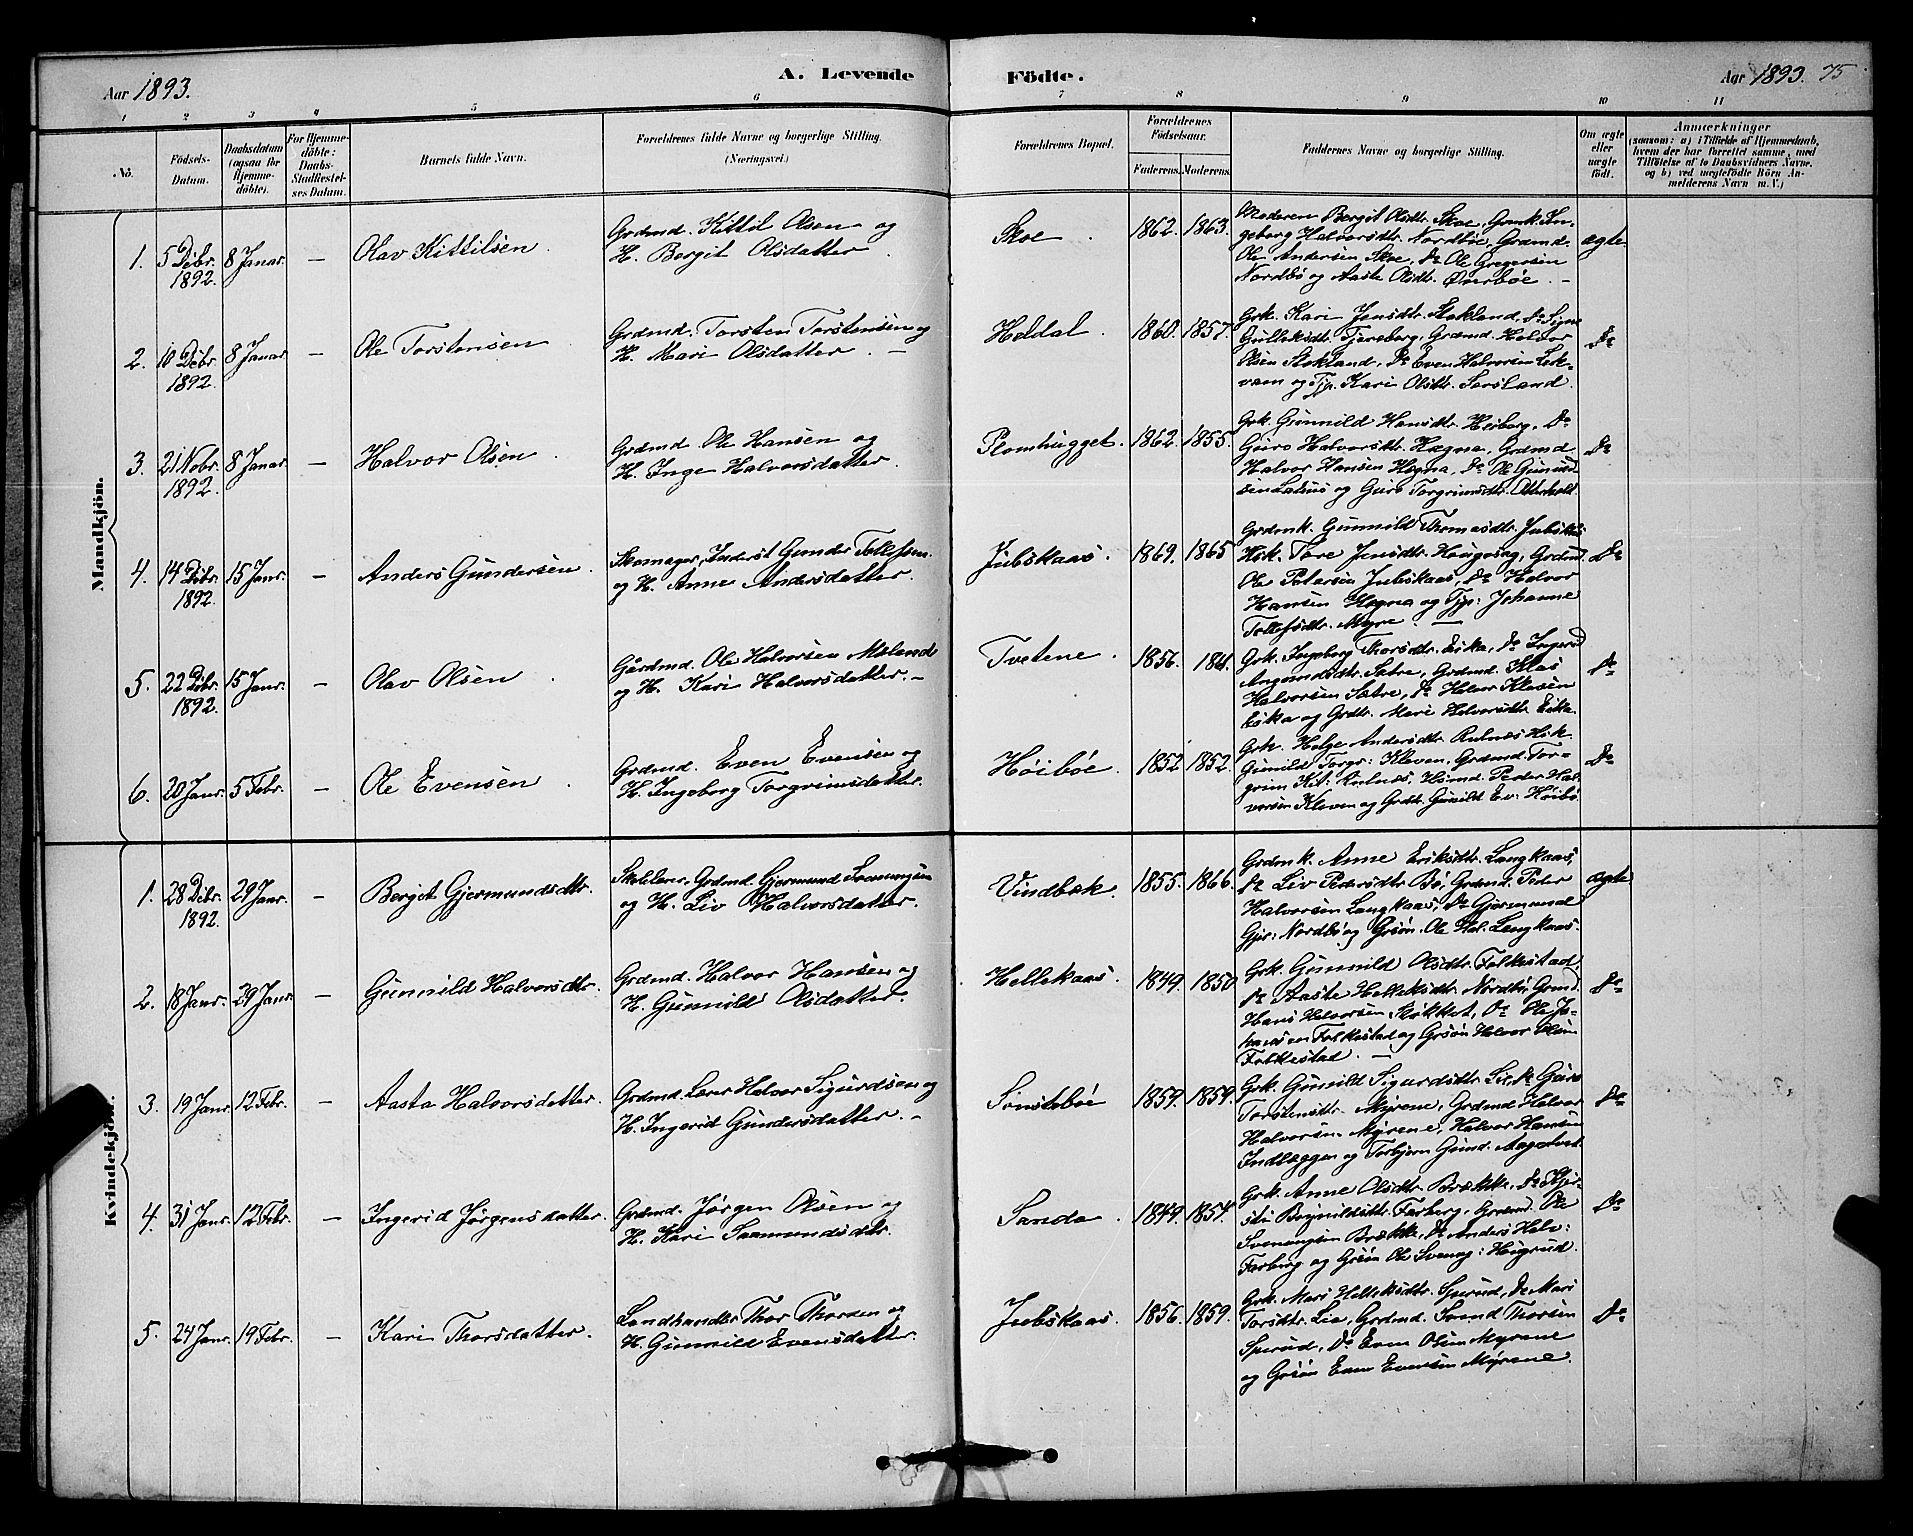 SAKO, Bø kirkebøker, G/Ga/L0005: Klokkerbok nr. 5, 1883-1897, s. 75